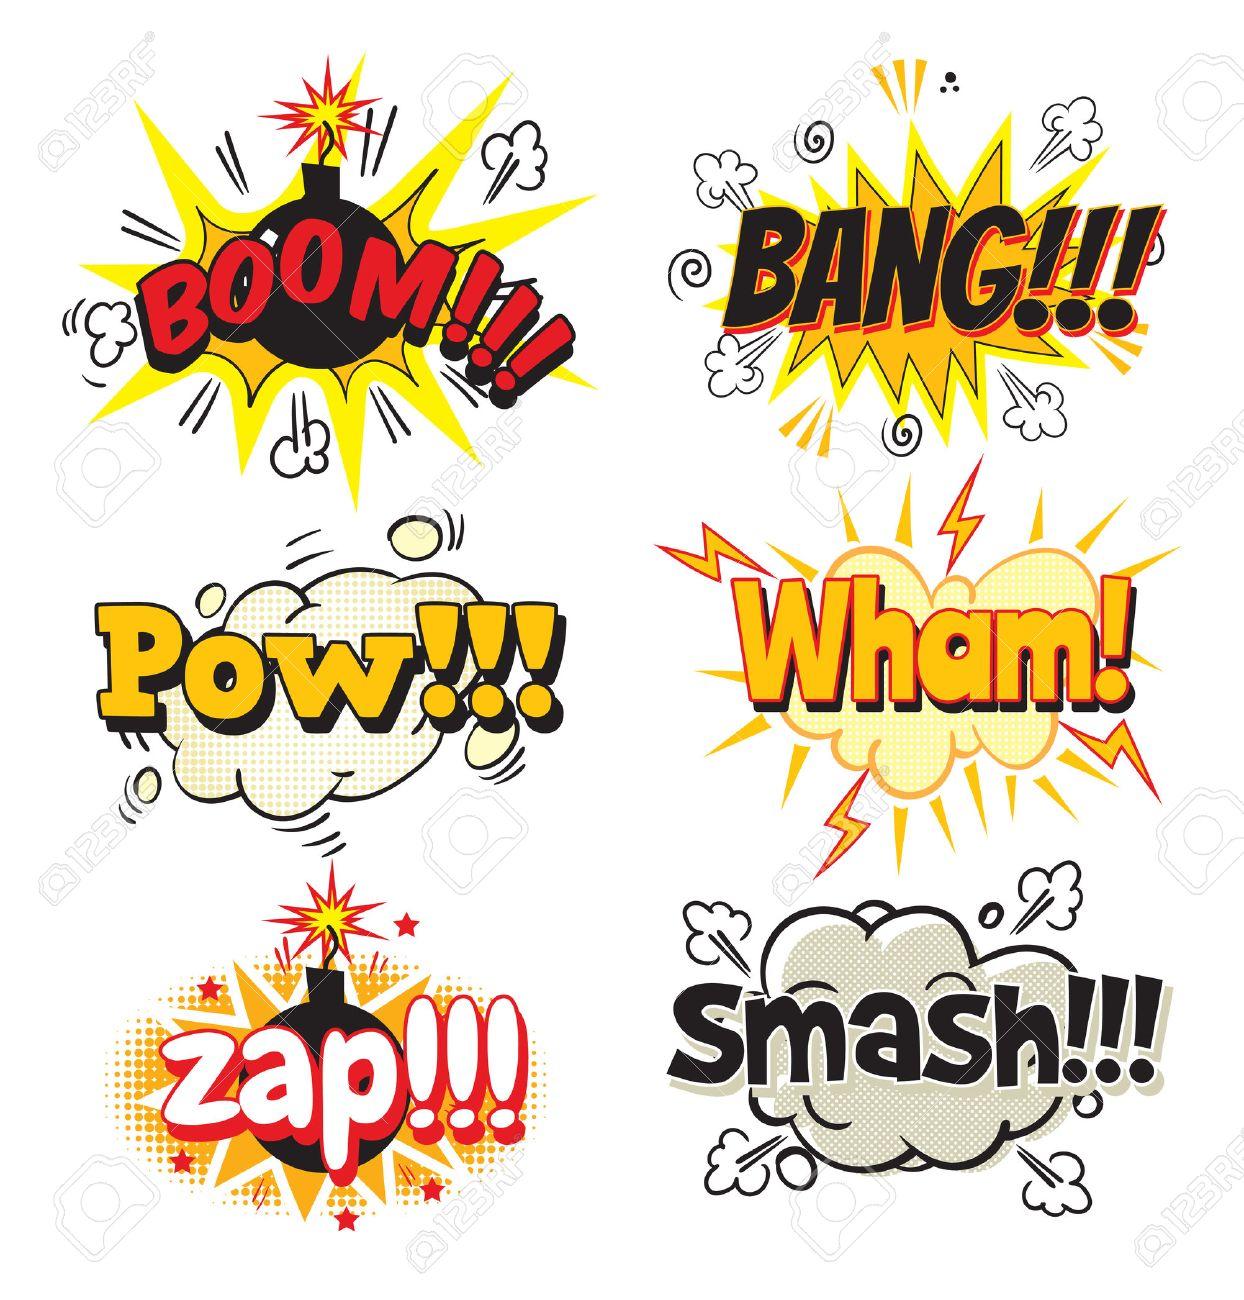 boom bang pow wham zap smash bubble template for comics